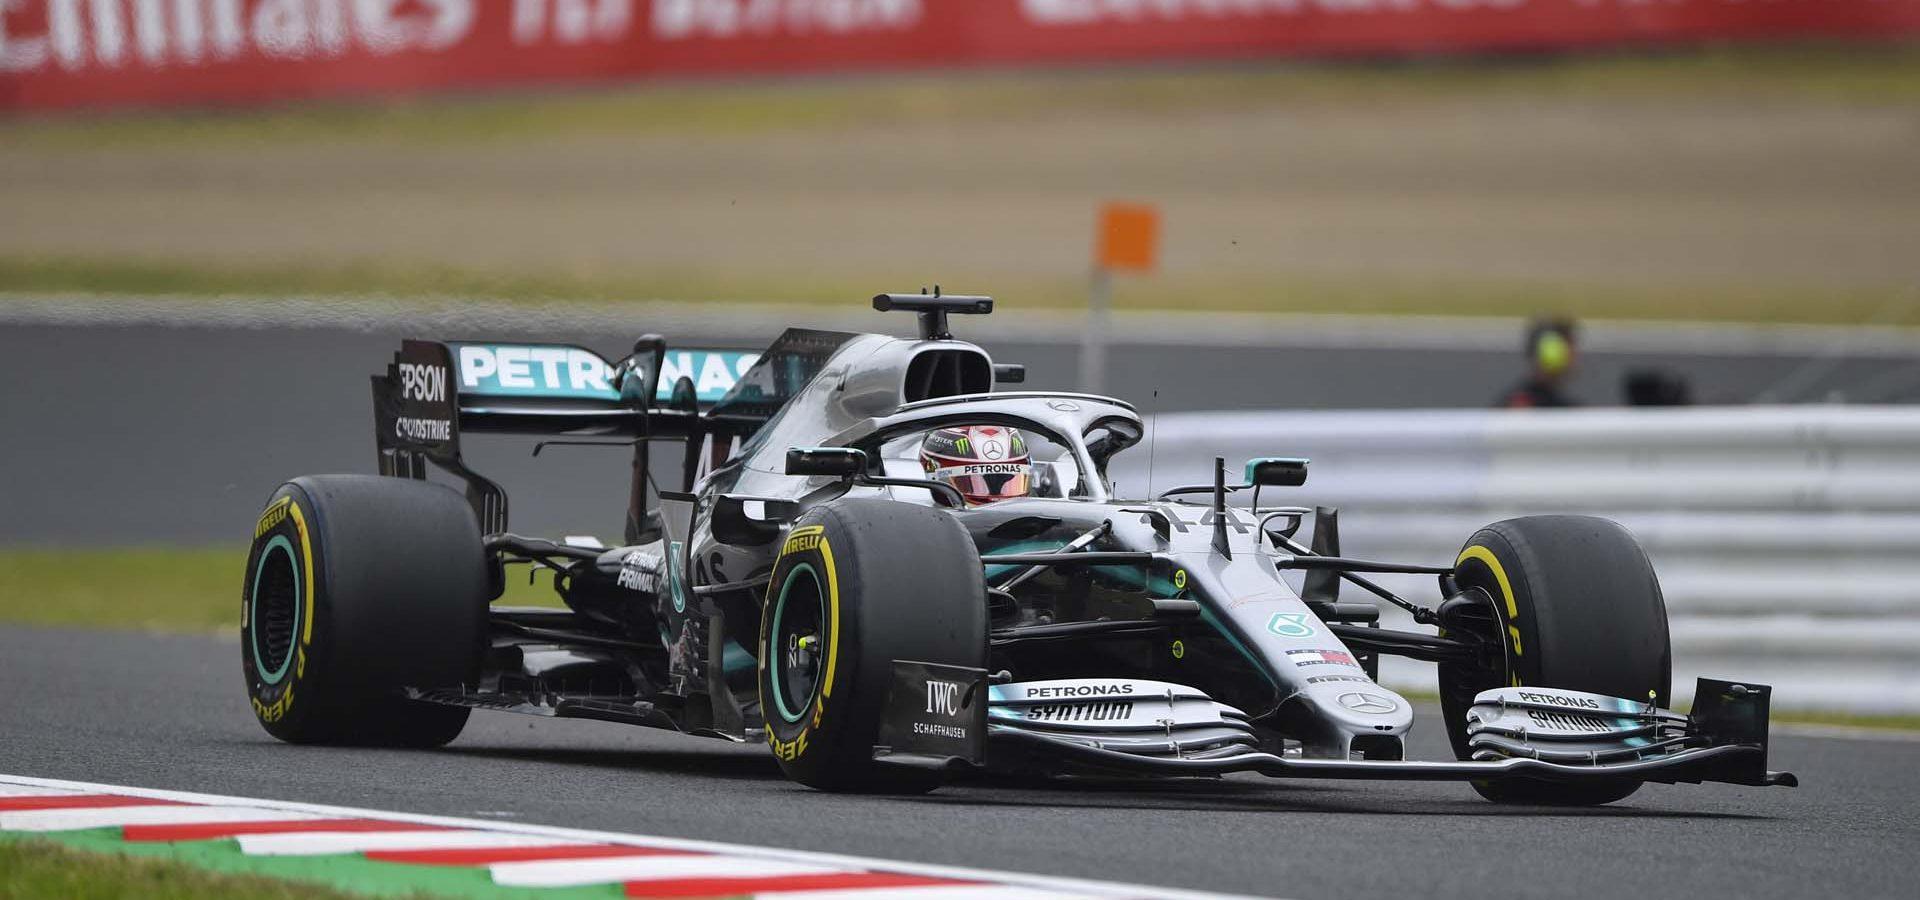 2019 Japanese Grand Prix, Friday - LAT Images Lewis Hamilton Mercedes